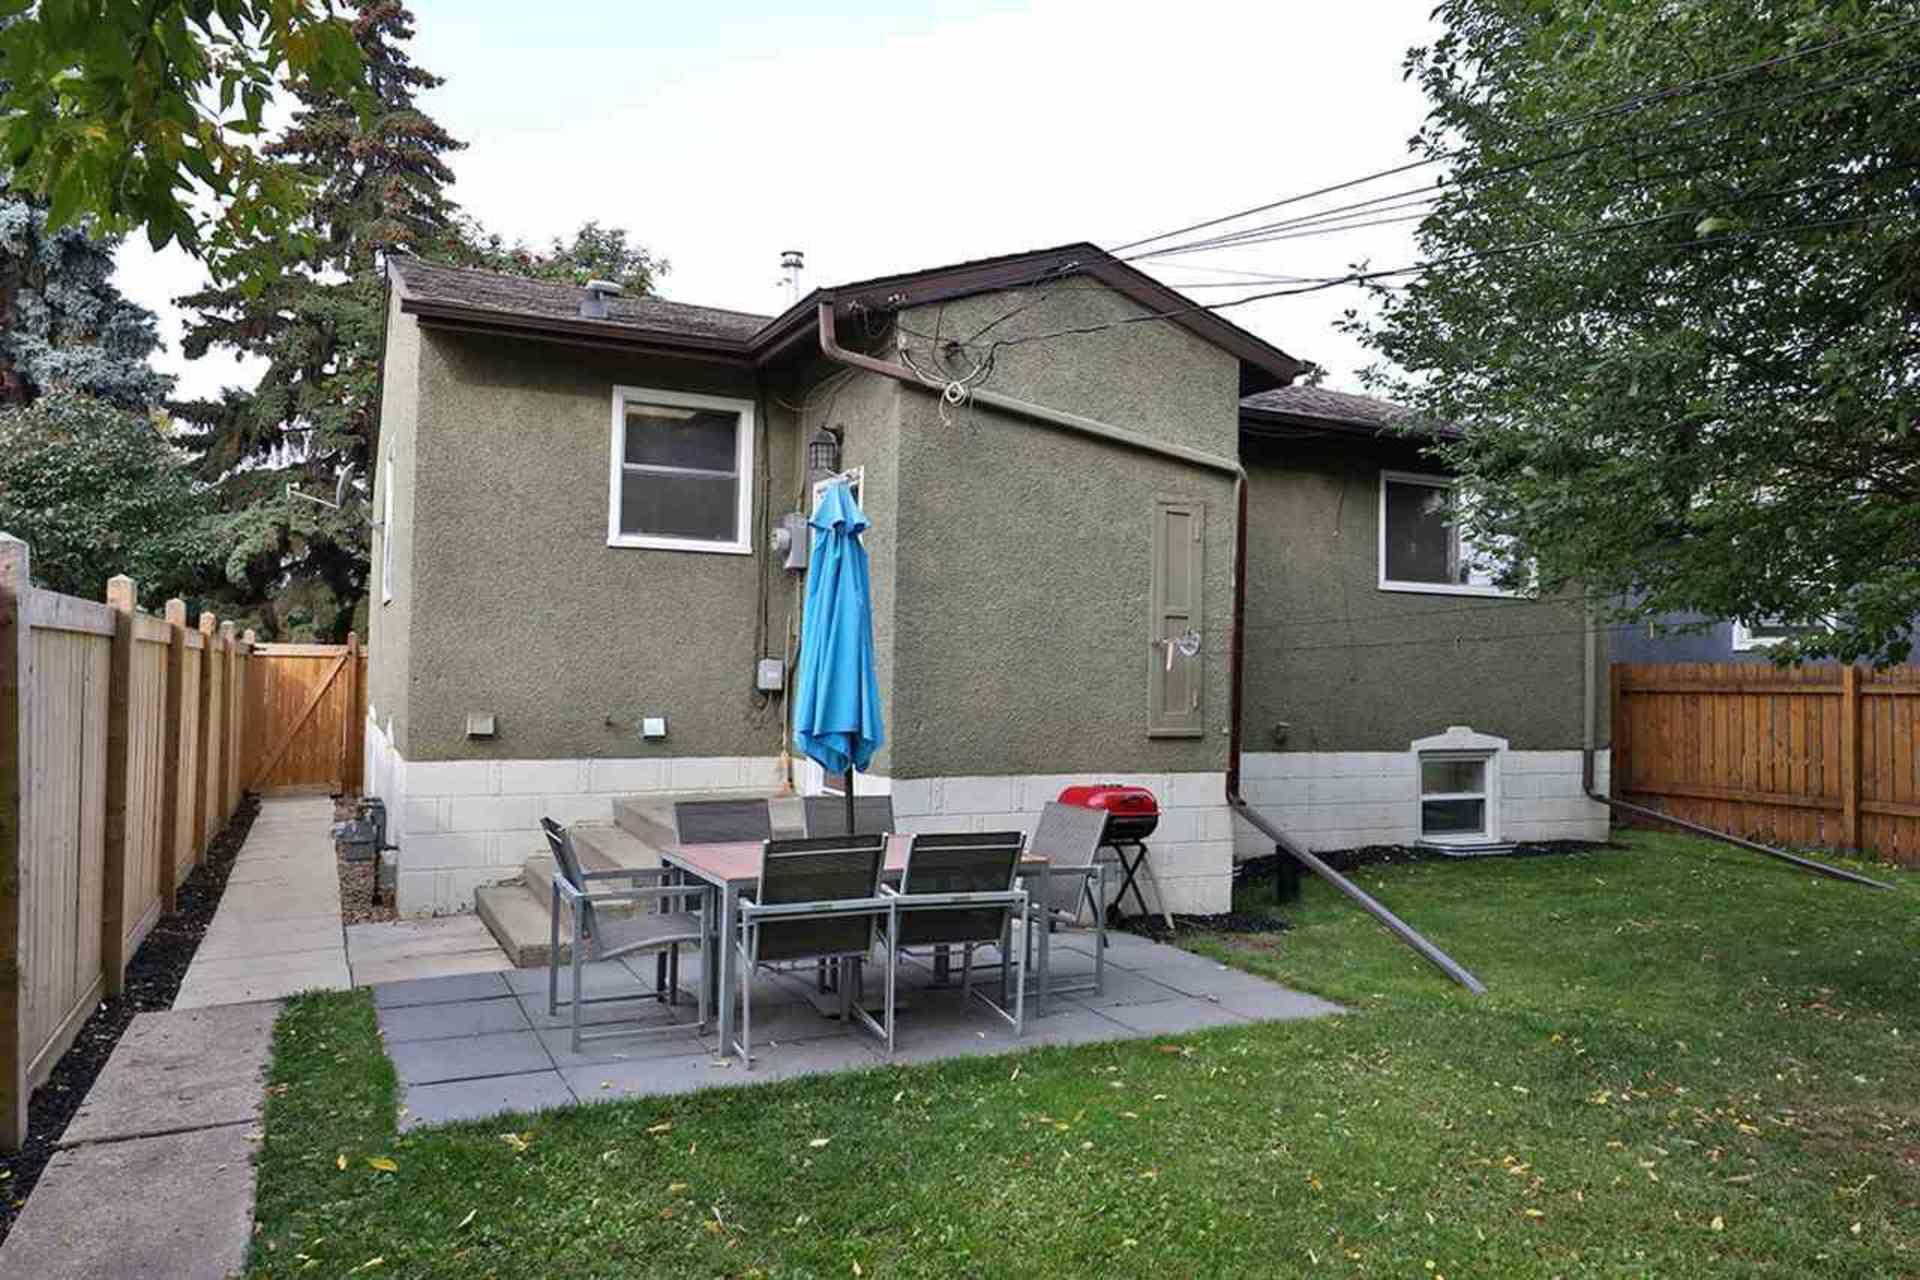 8819-87-street-bonnie-doon-edmonton-16 at 8819 87 Street, Bonnie Doon, Edmonton